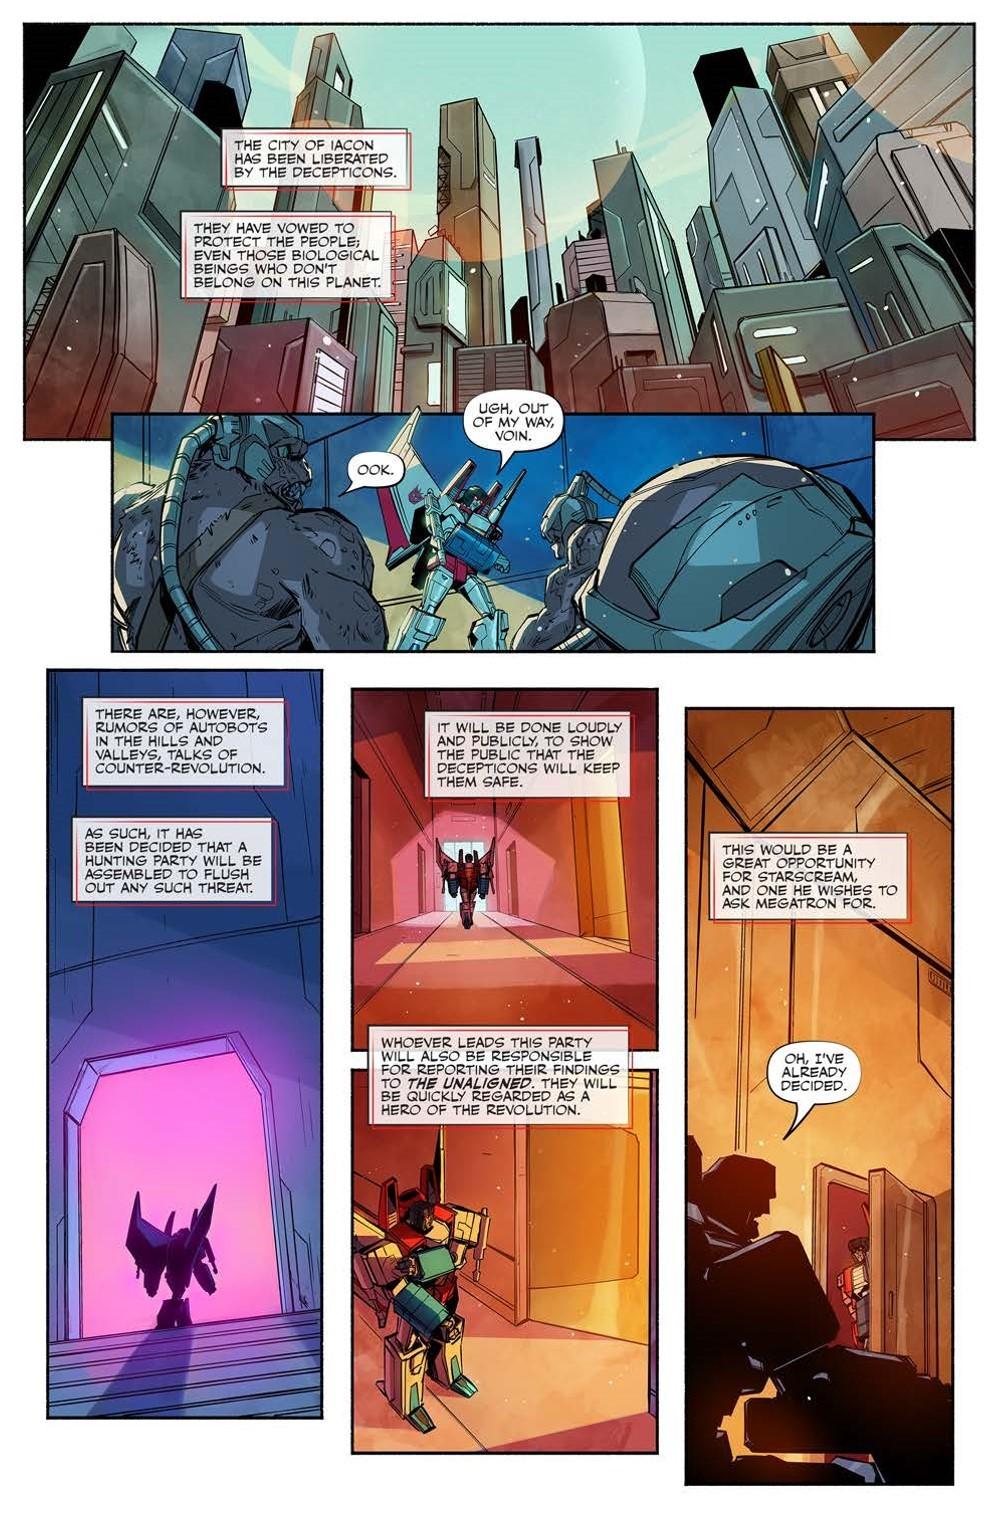 TFHalloween2021_pr-3 ComicList Previews: TRANSFORMERS HALLOWEEN SPECIAL #1